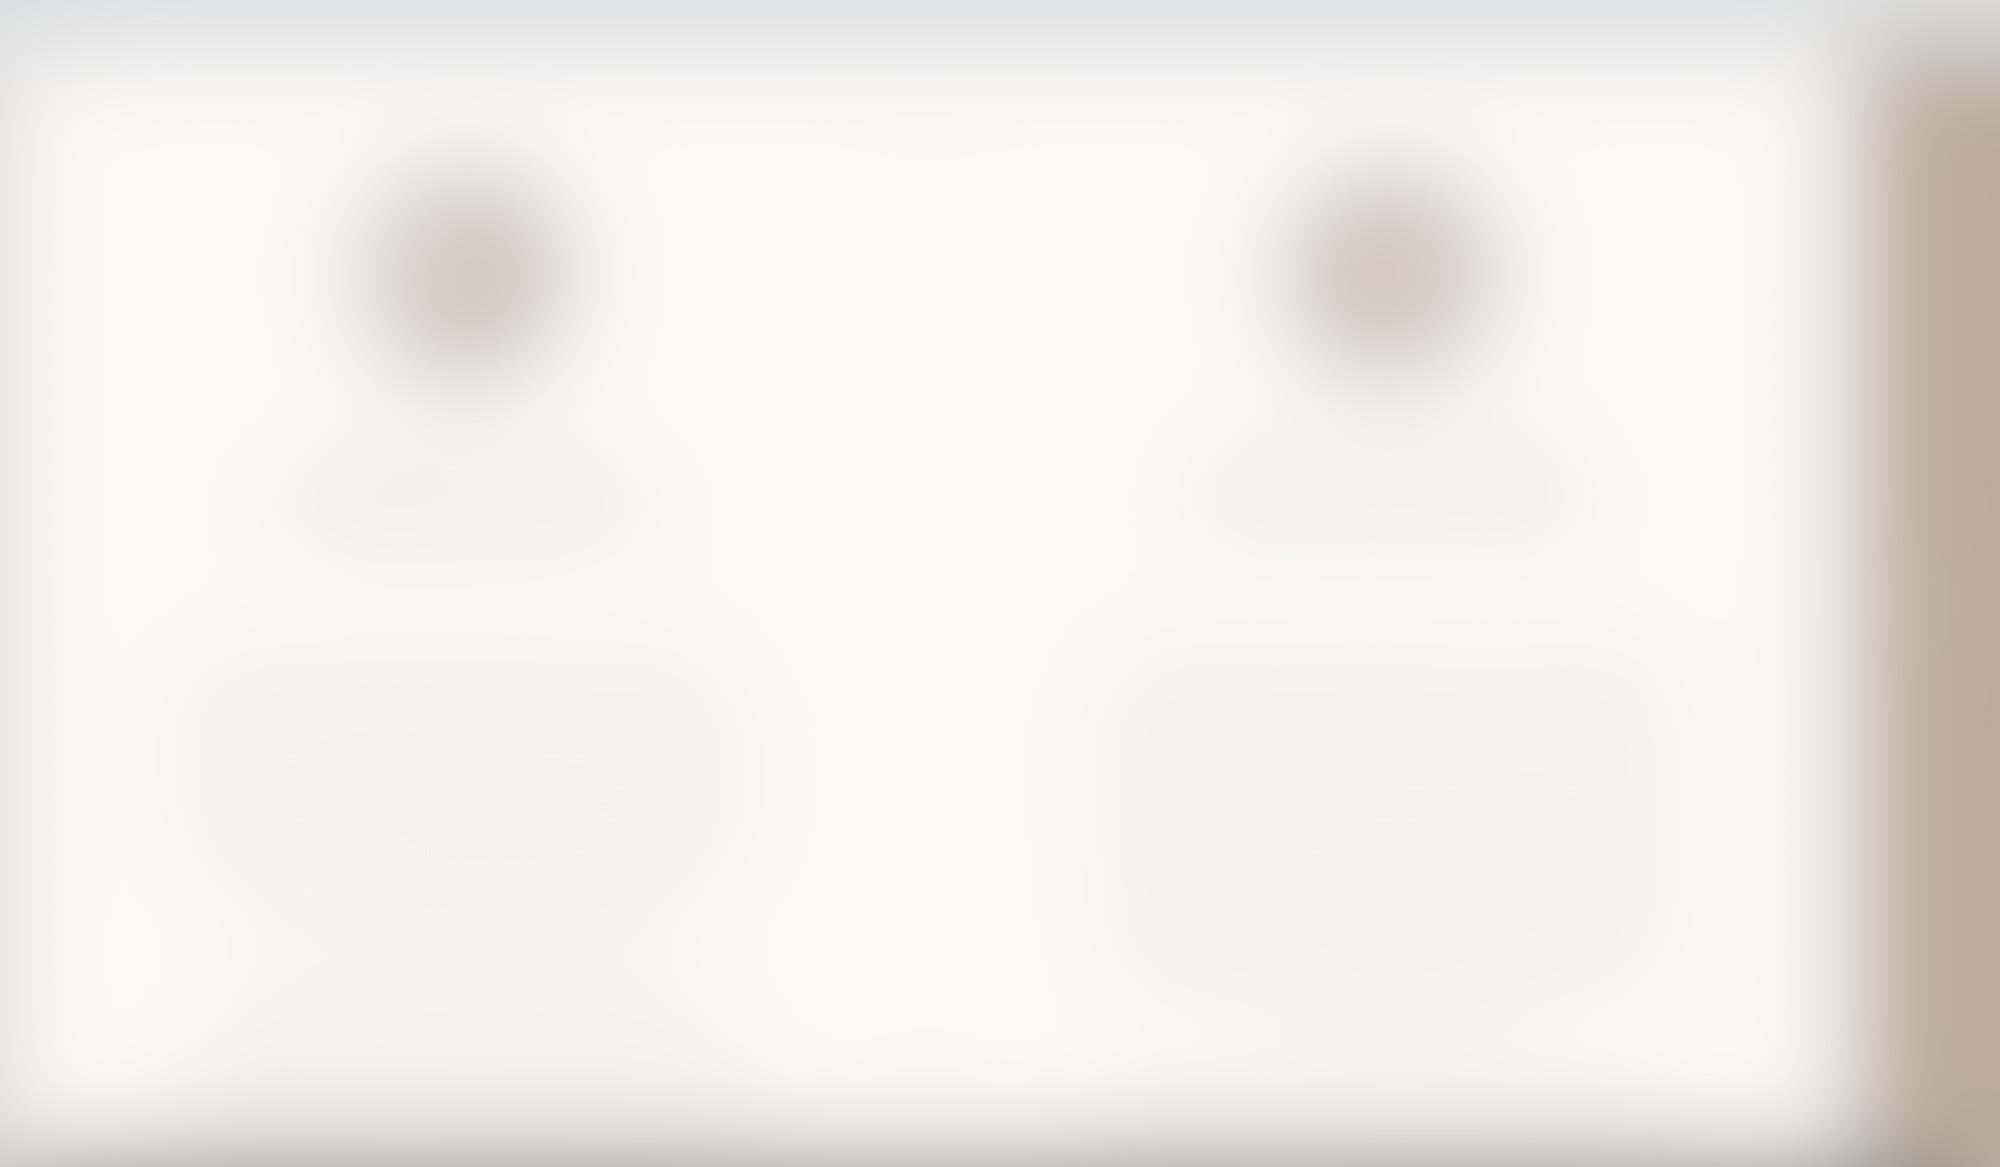 Ekkist 9 autocompressfitresizeixlibphp 1 1 0max h2000max w3 D2000q80s02cef662dc3782440ad8d267c7fa578e